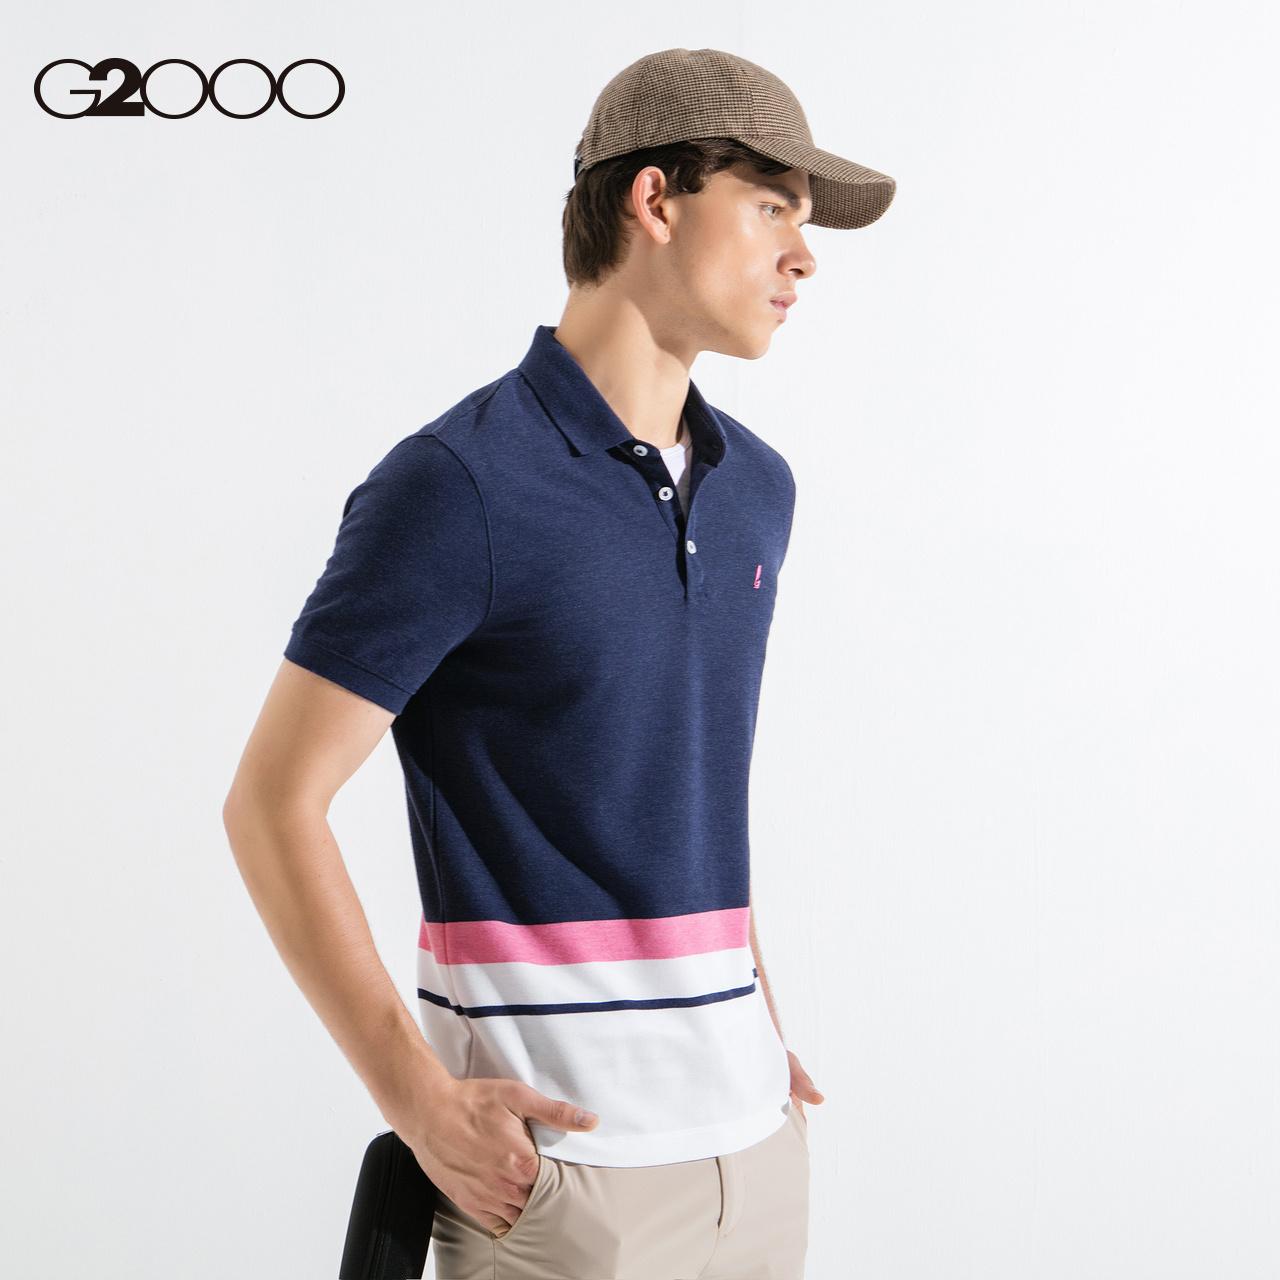 G2000男装时尚撞色翻领T恤 2018新款棉质透气修身短袖POLO衫